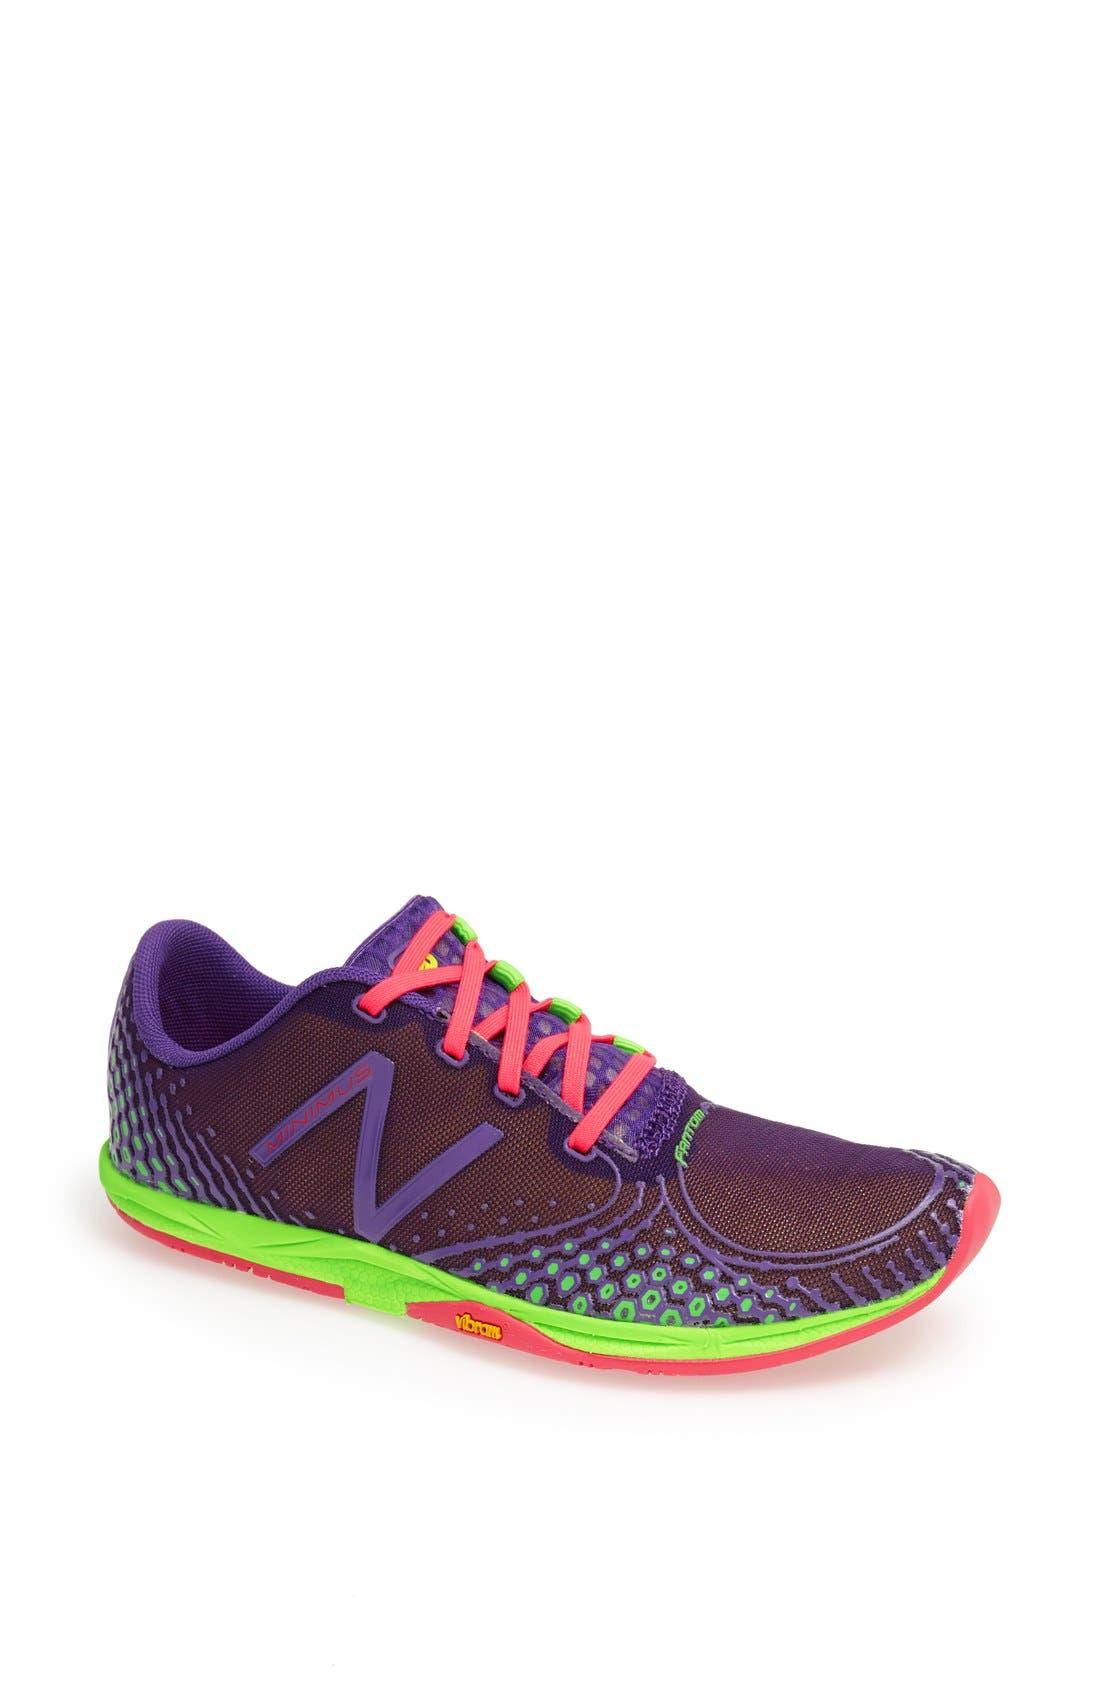 Alternate Image 1 Selected - New Balance 'Minimus Zero V2' Minimal Road Running Shoe (Women)